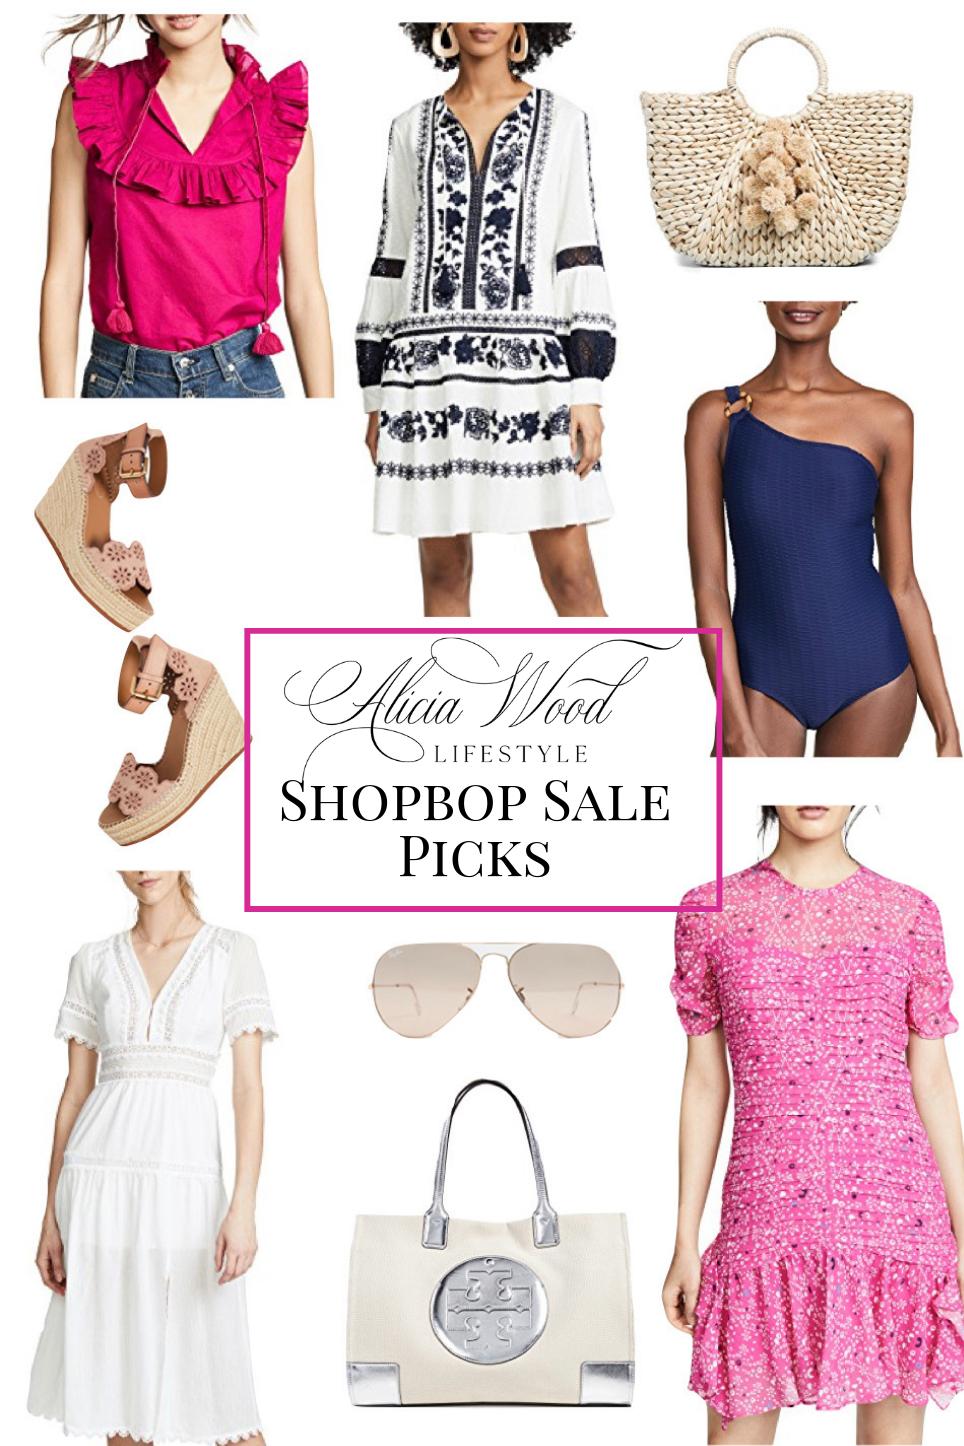 Alicia Wood Lifestyle Shopbop Sale Favorites